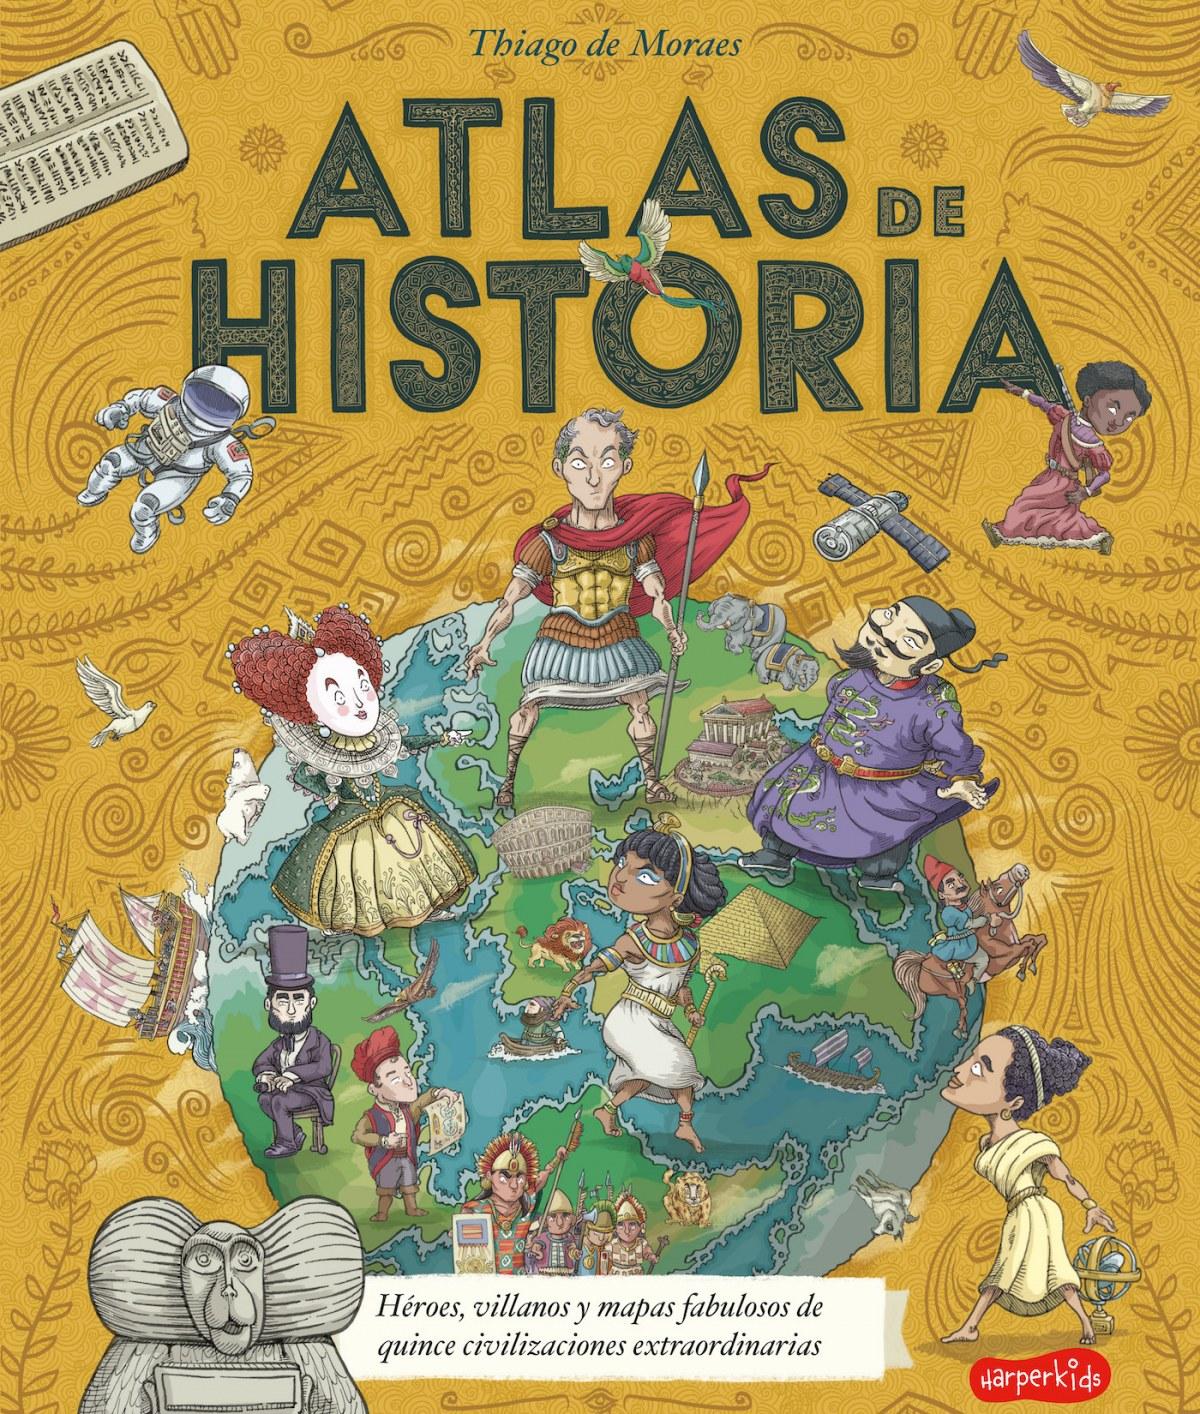 Atlas de historia